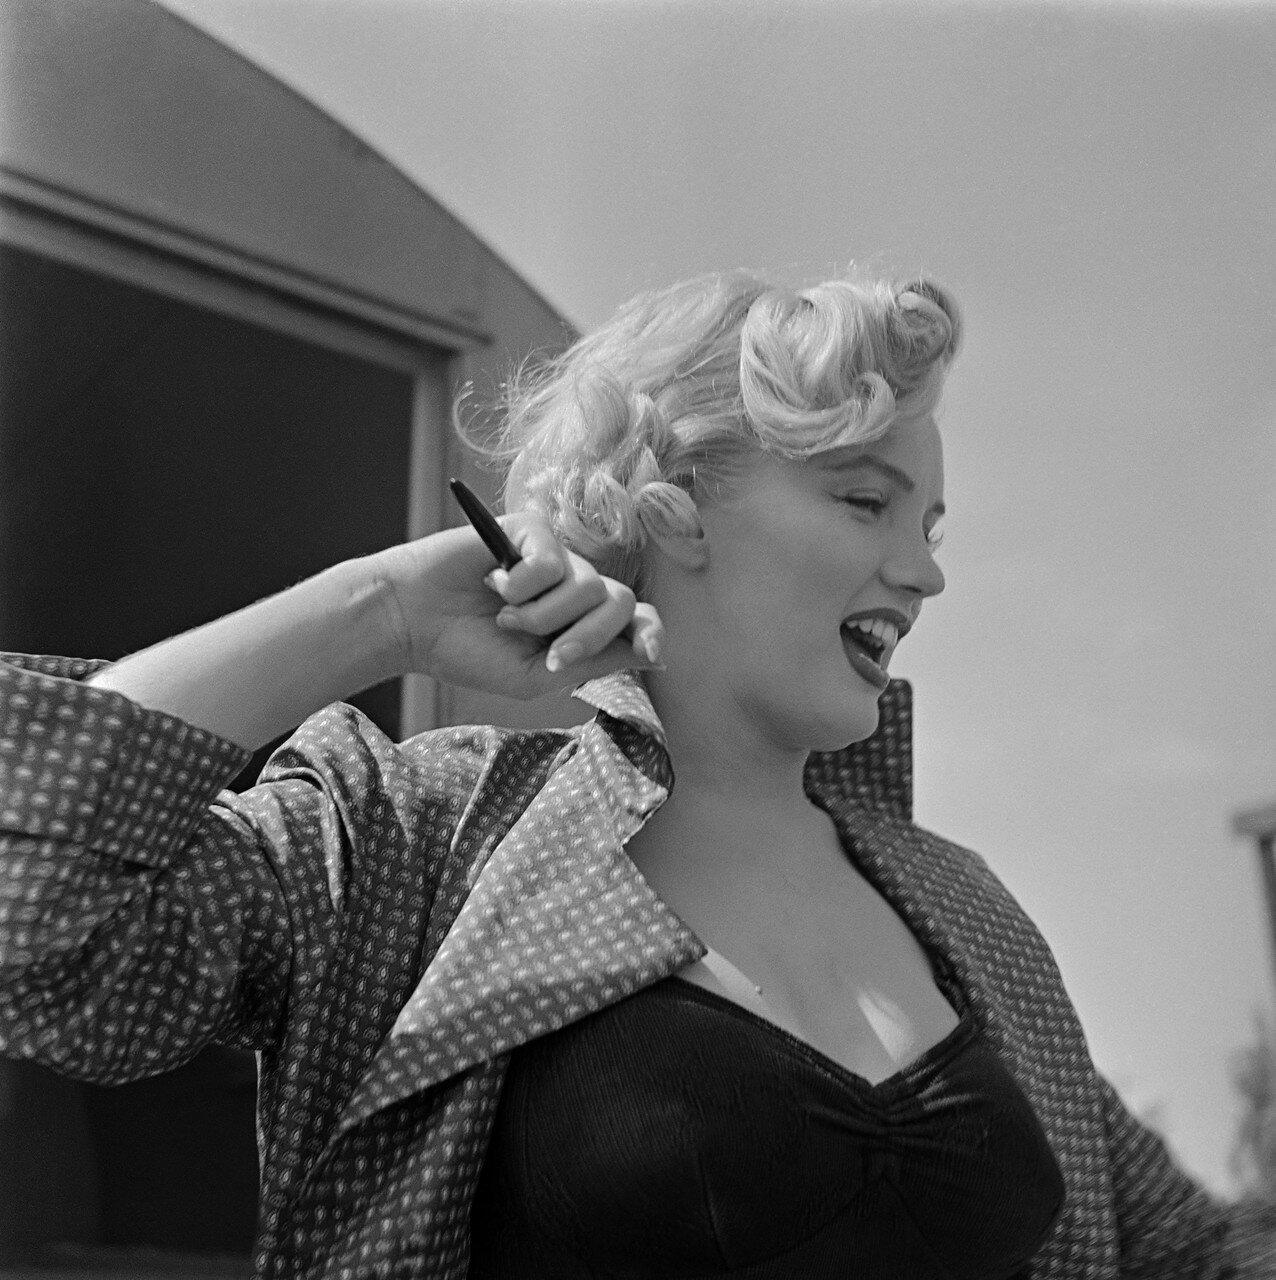 Head and Shoulders Portrait of Marilyn Monroe